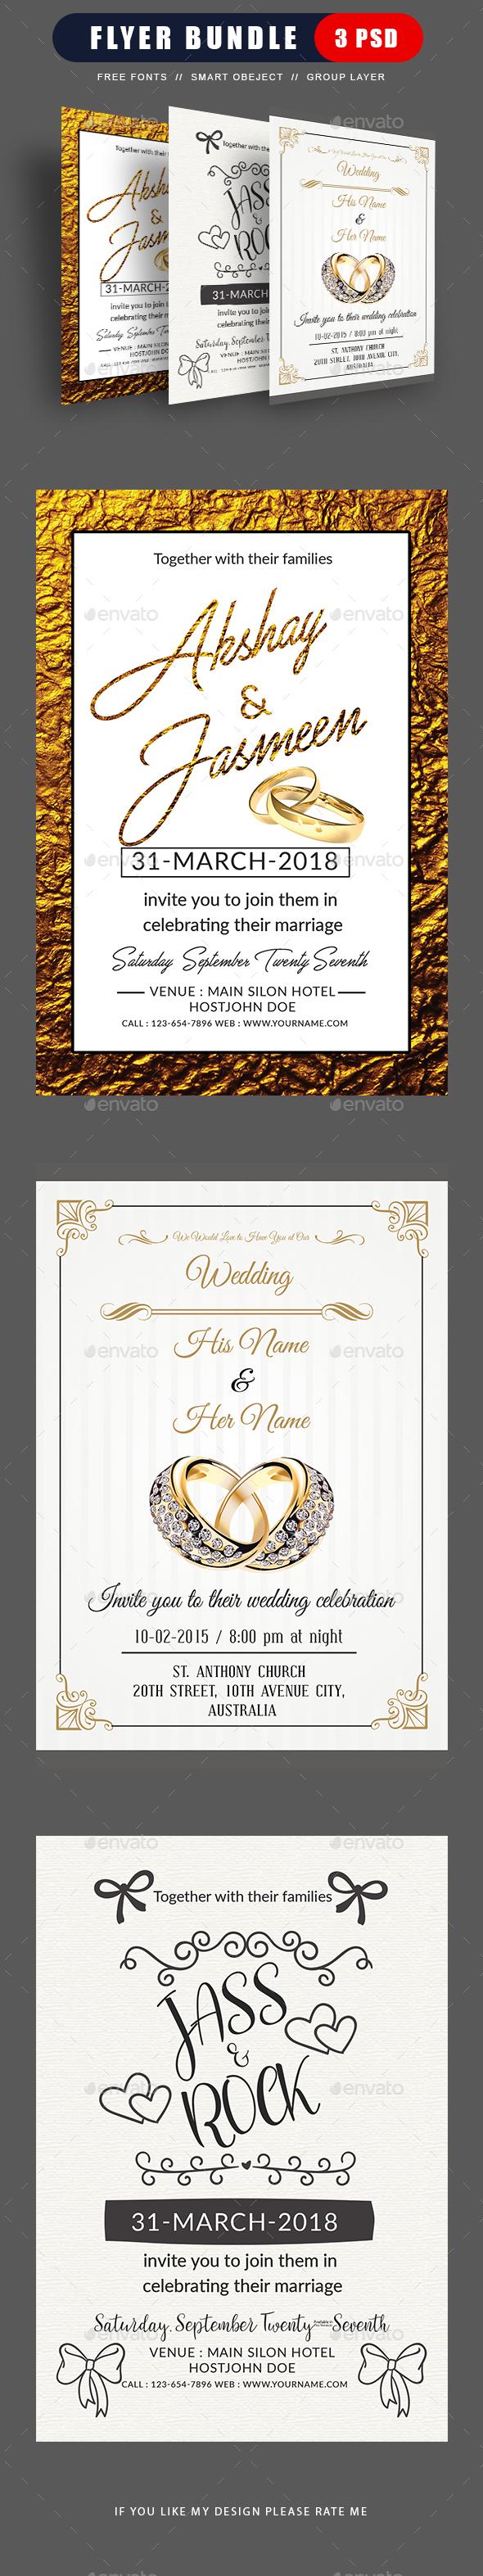 Wedding Flyer Template Bundle - Weddings Cards & Invites